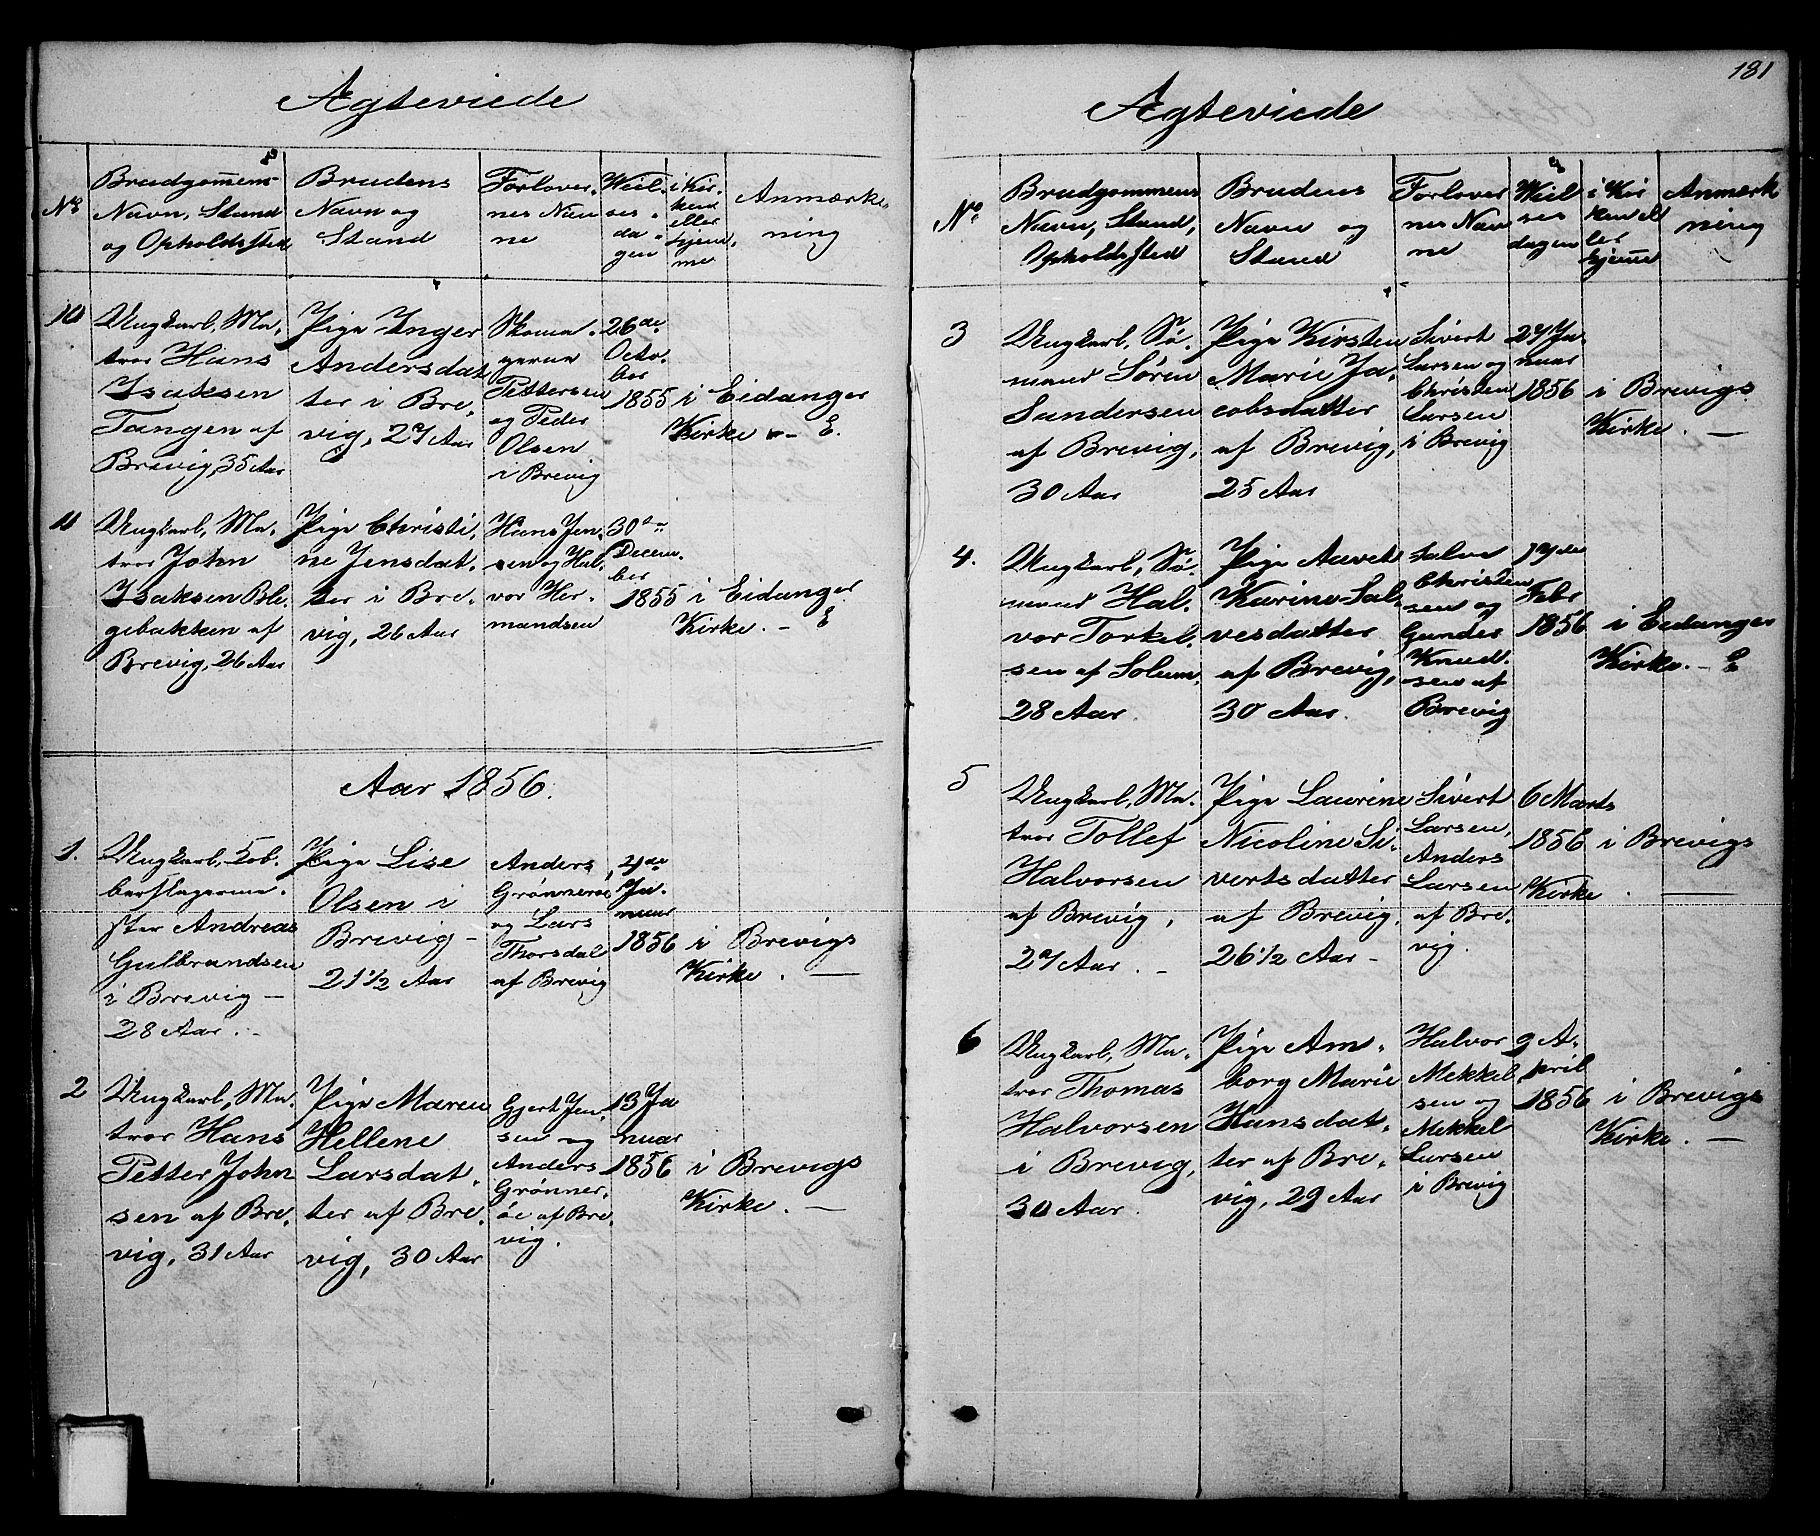 SAKO, Brevik kirkebøker, G/Ga/L0002: Klokkerbok nr. 2, 1846-1865, s. 181